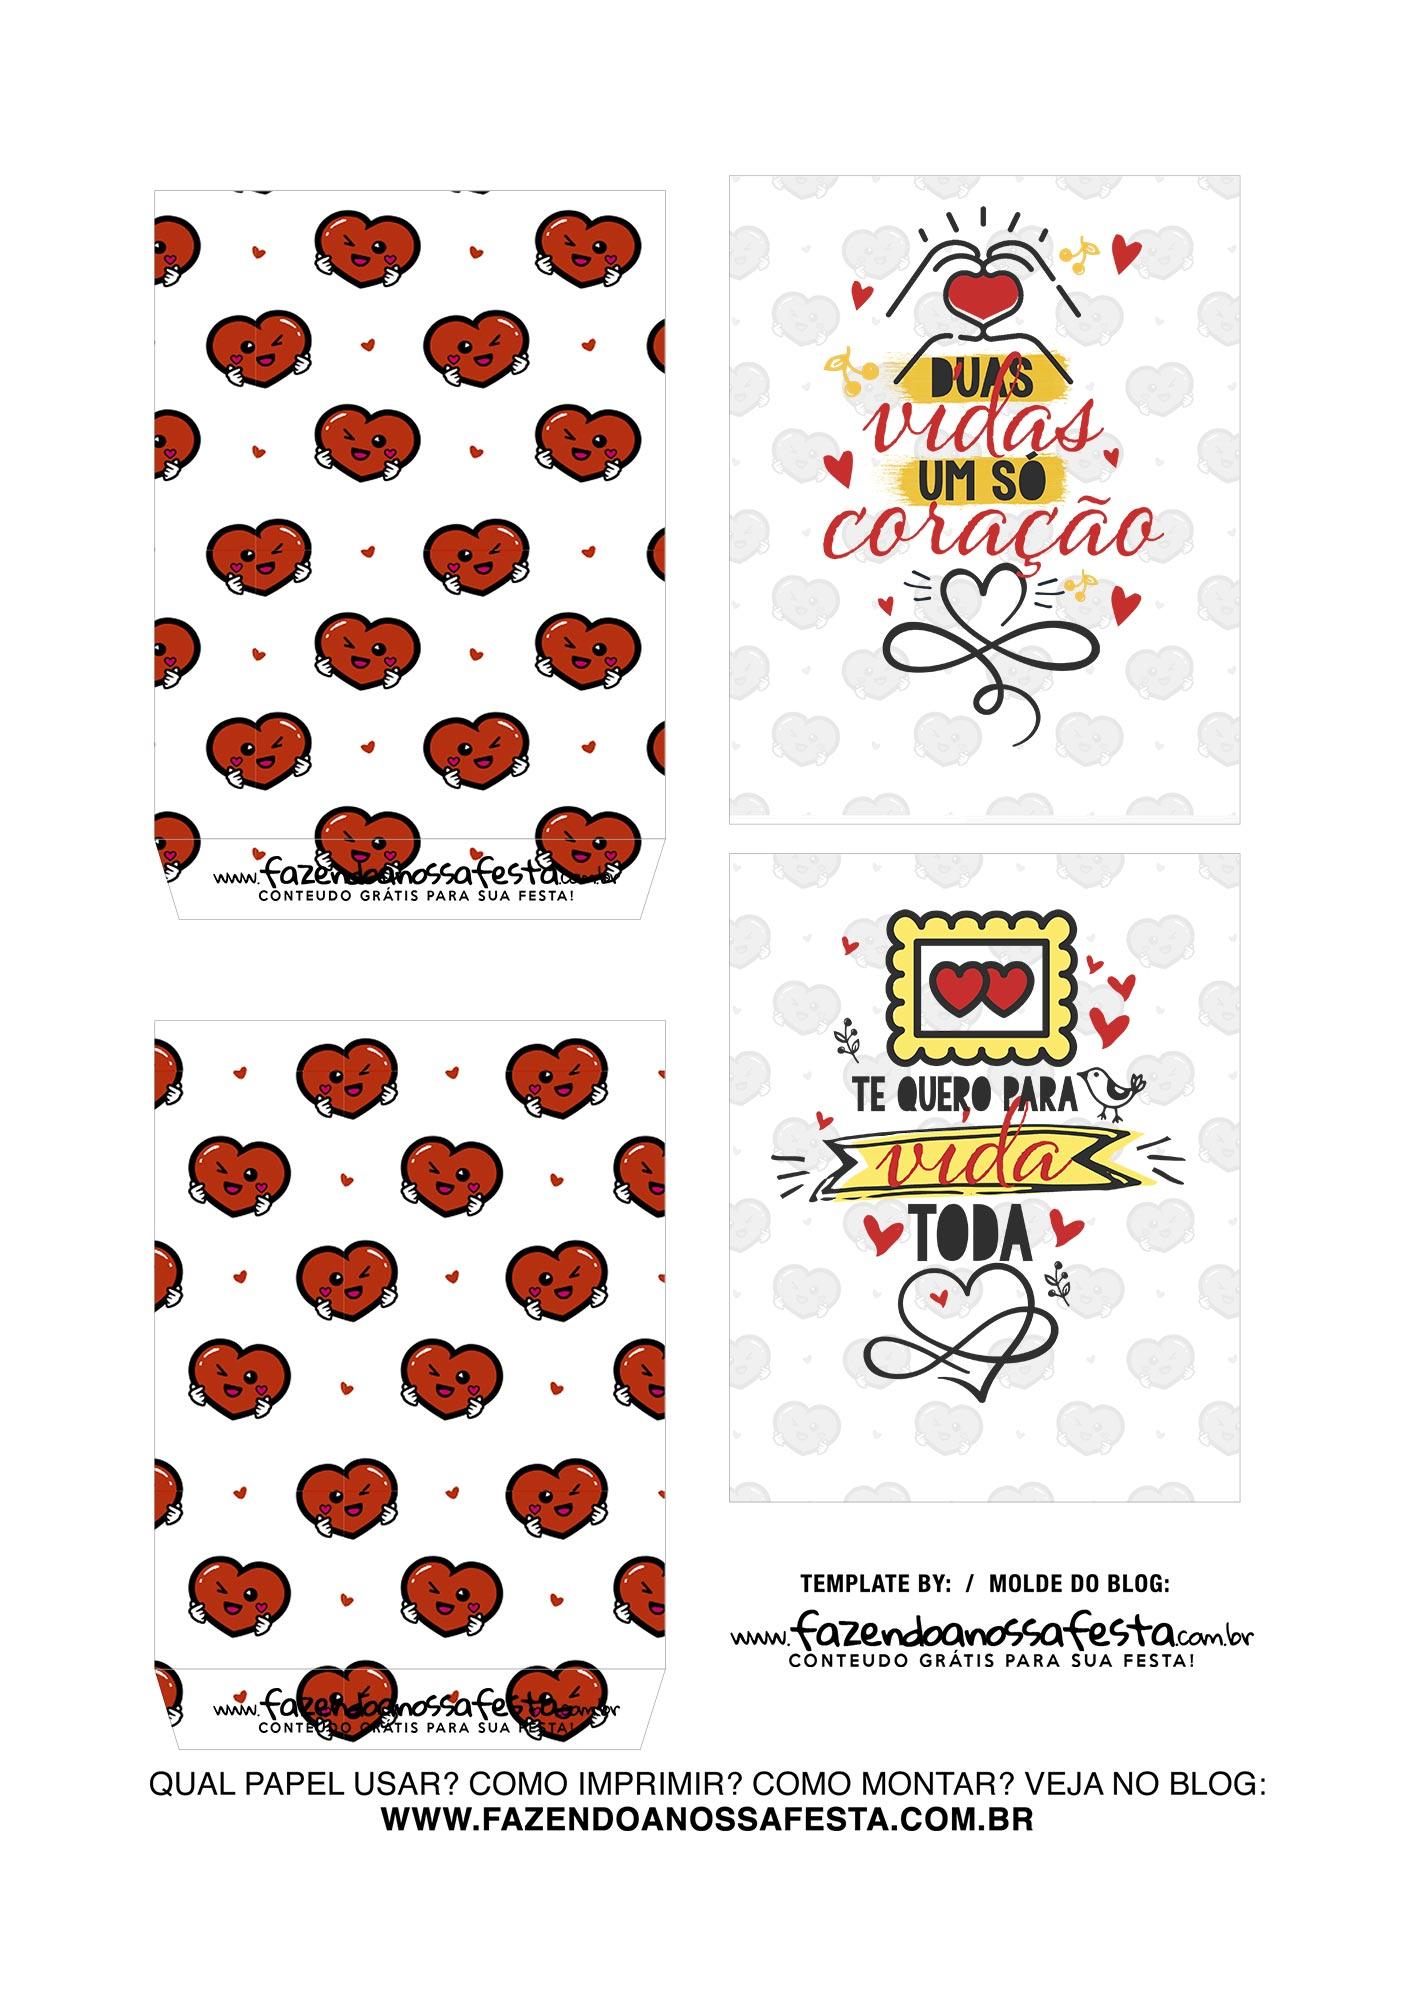 Caixa Explosiva Dia dos Namorados Paradigmas 3